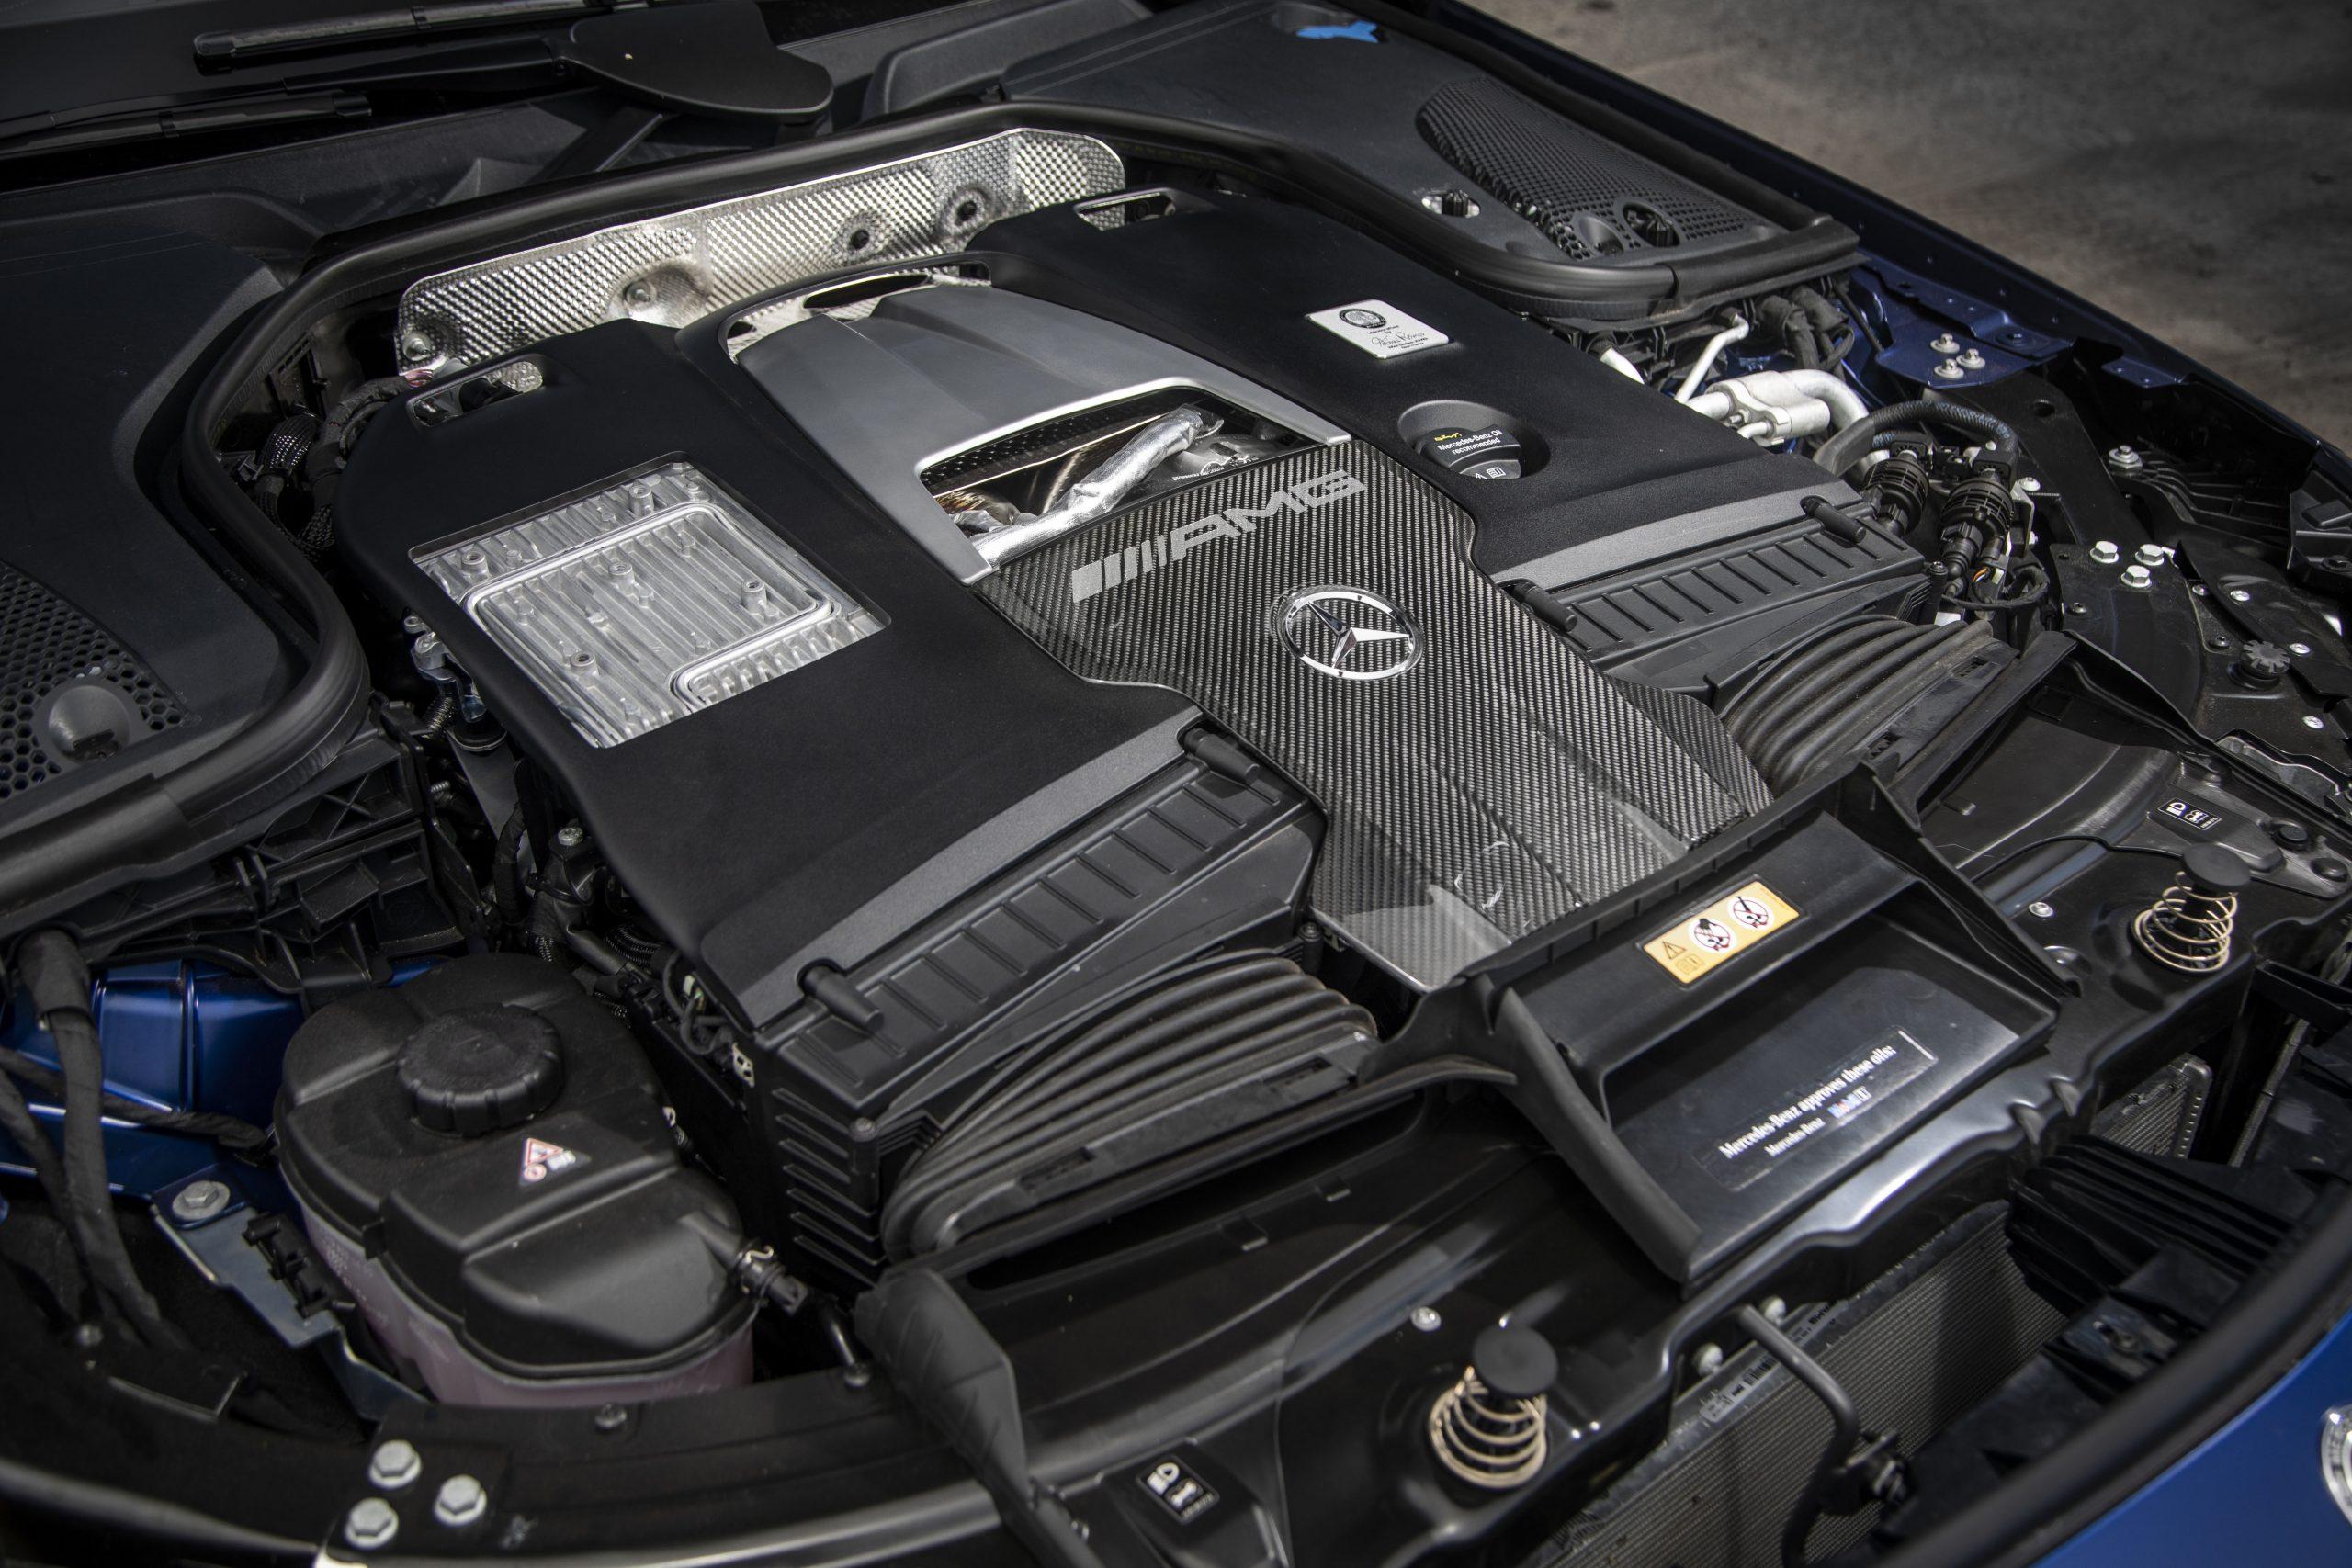 2021 Mercedes-AMG GT 63 S Engine